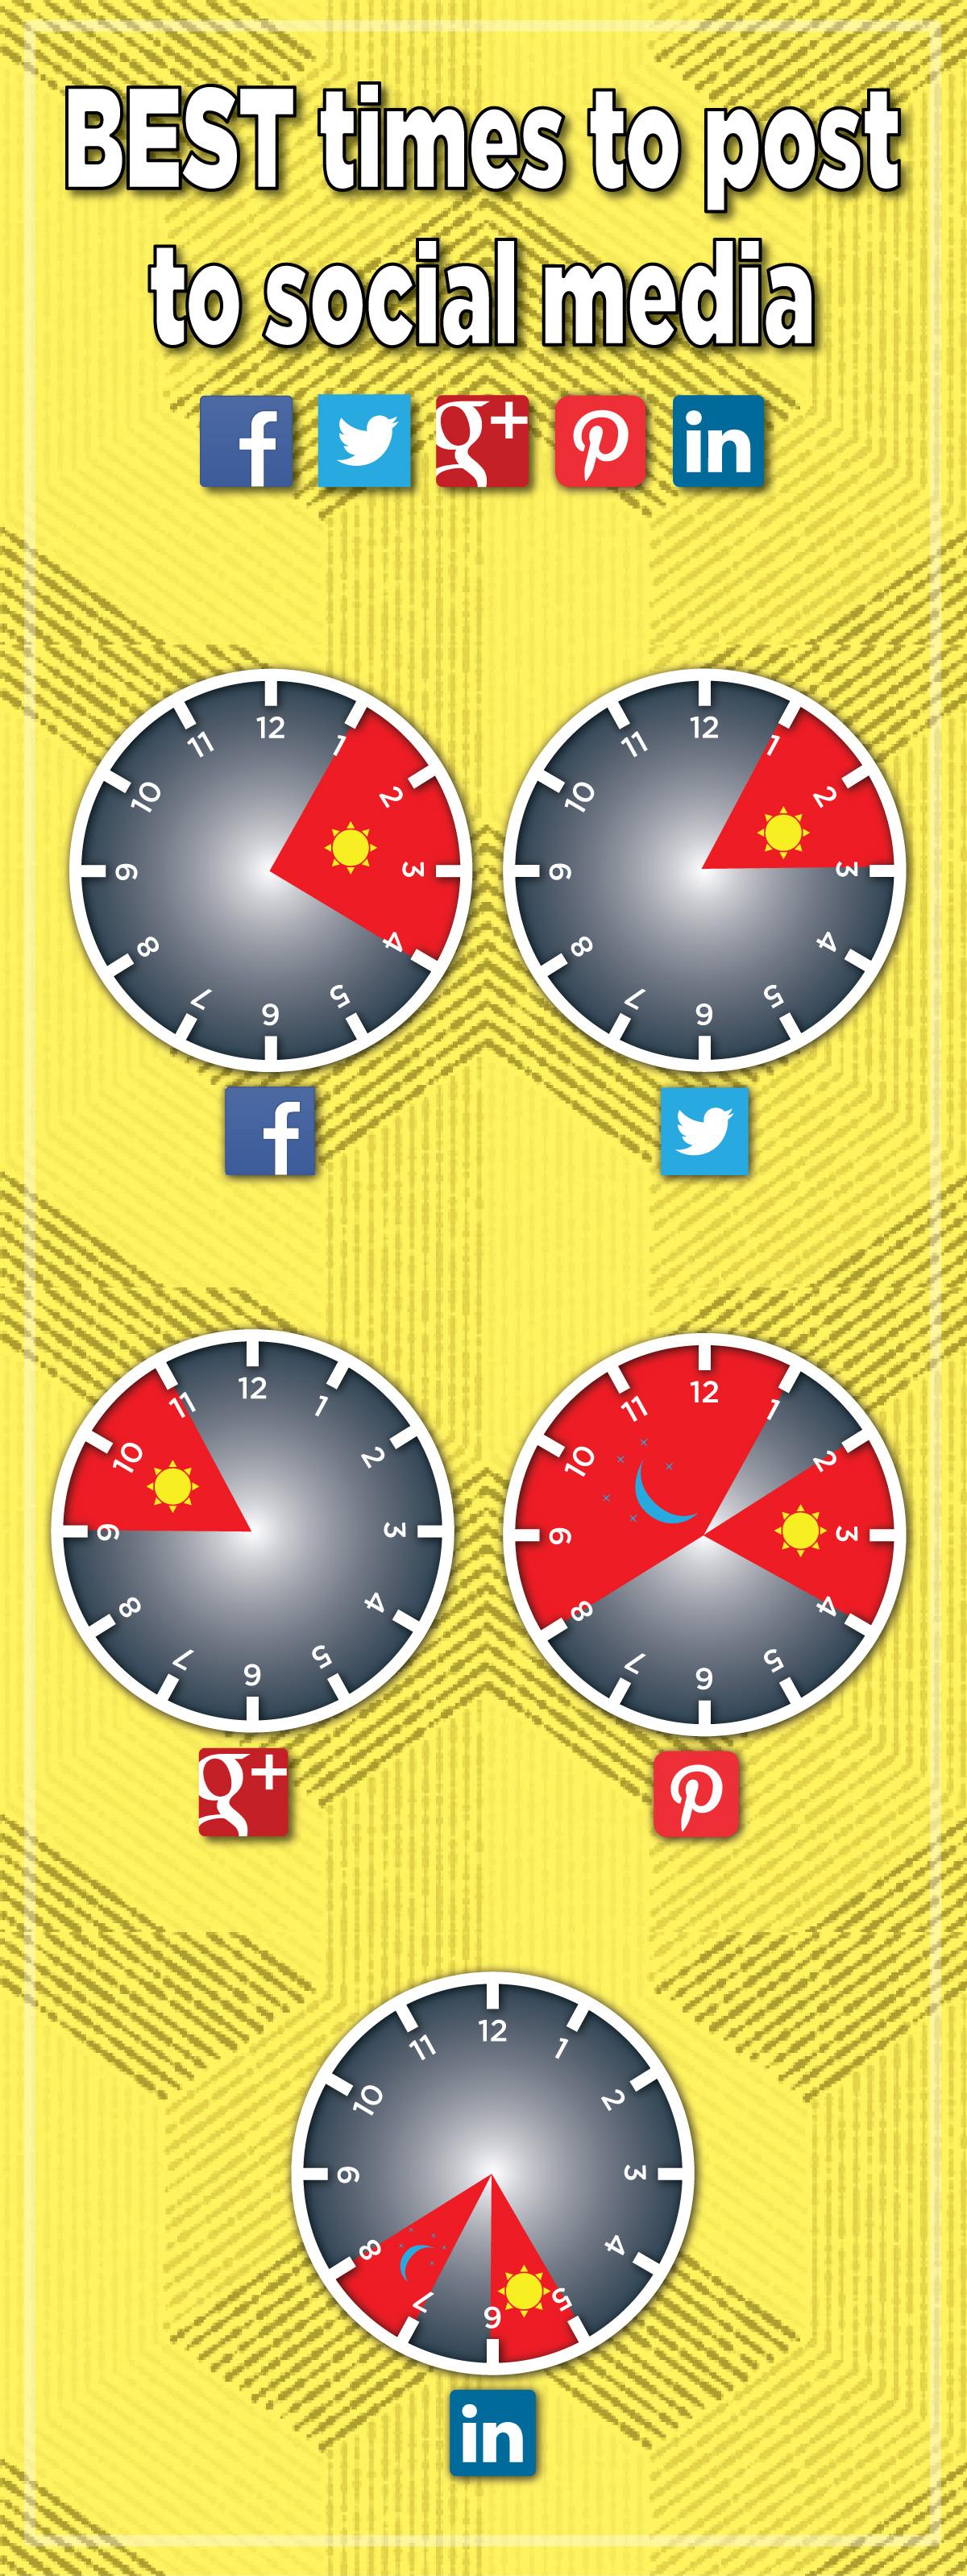 Social_Media_Posting_Times